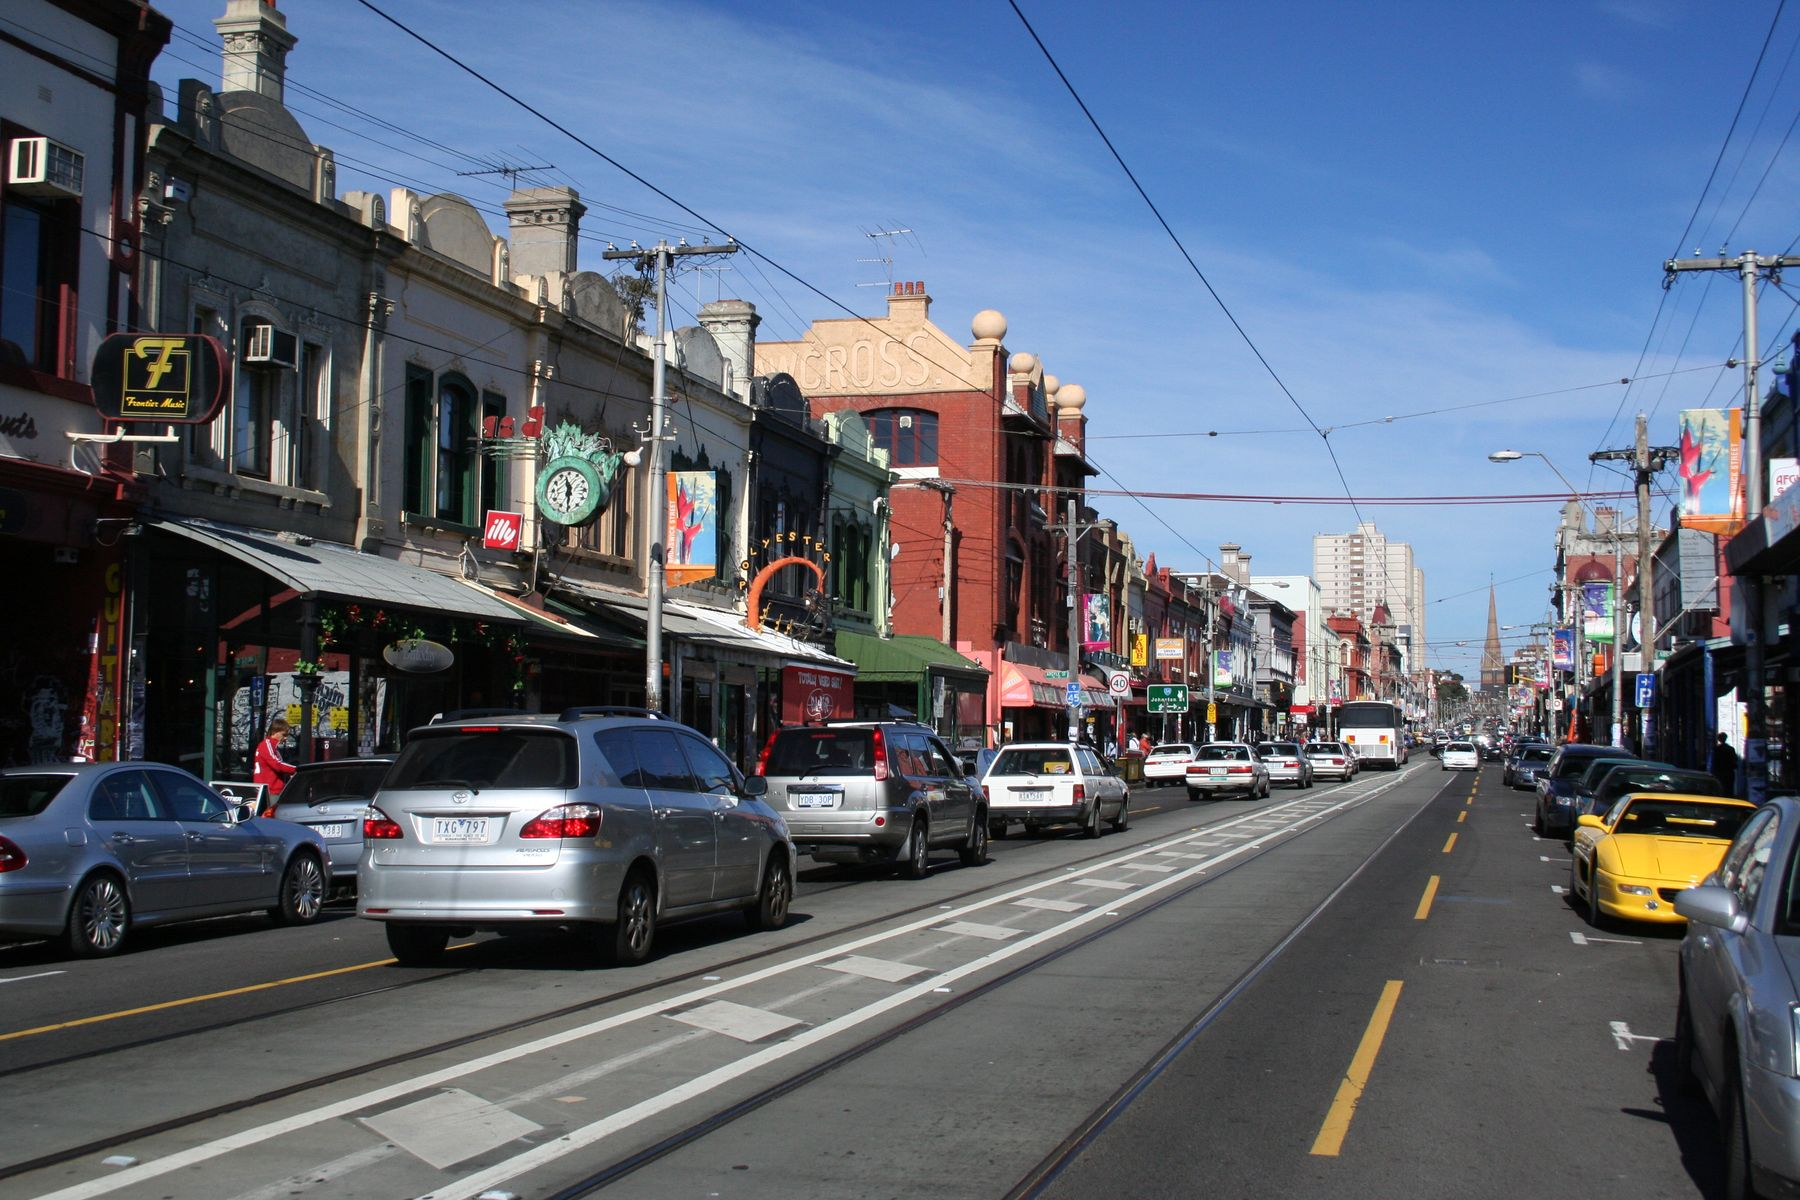 Brunswick Street, Fitzroy, Victoria, Australia